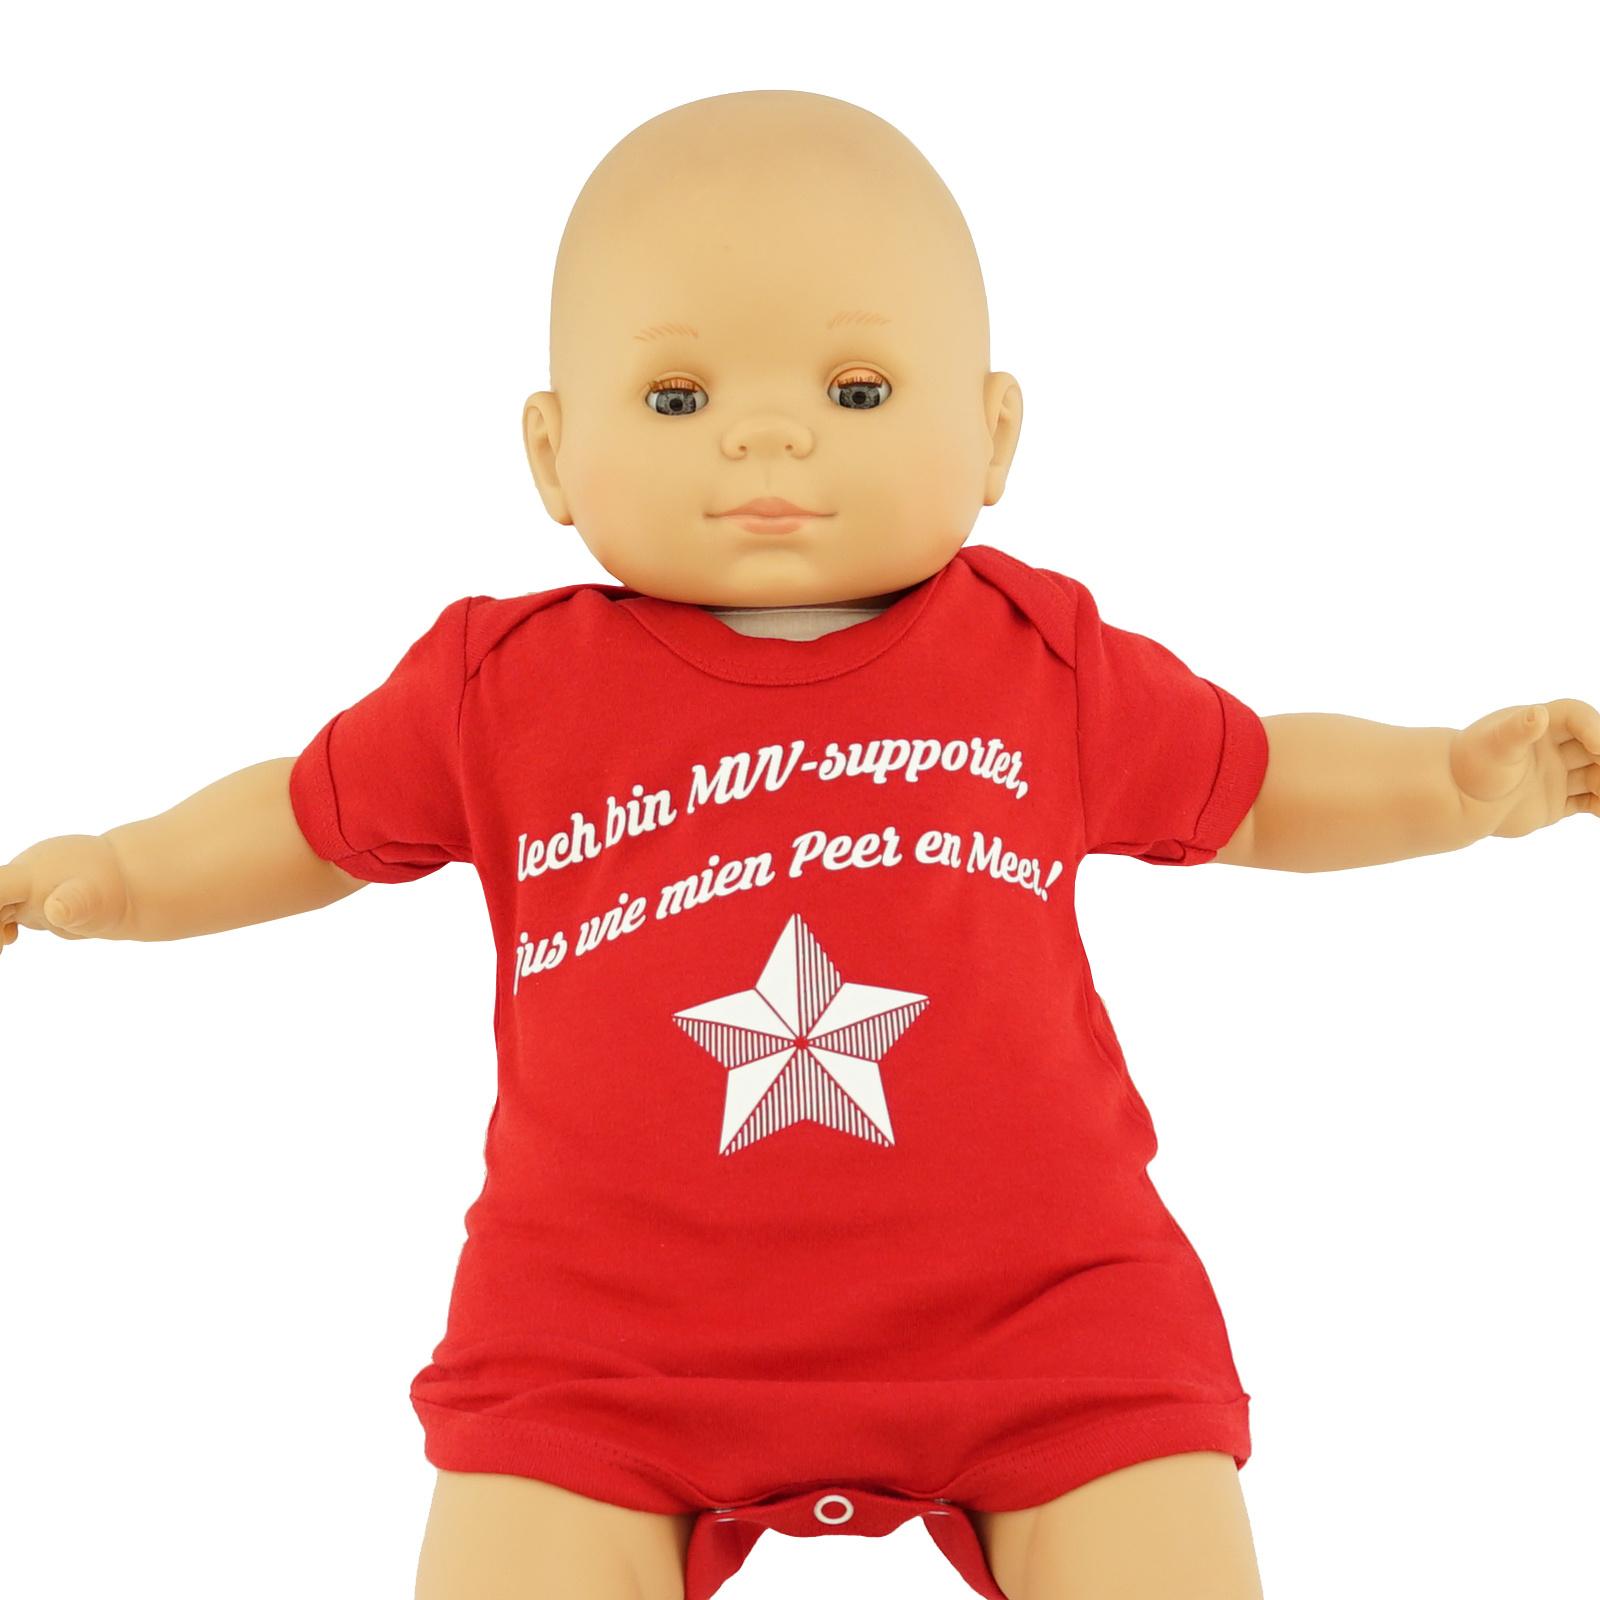 Baby body - rood - Iech bin MVV-supporter, sjus wie mien Peer en Meer!